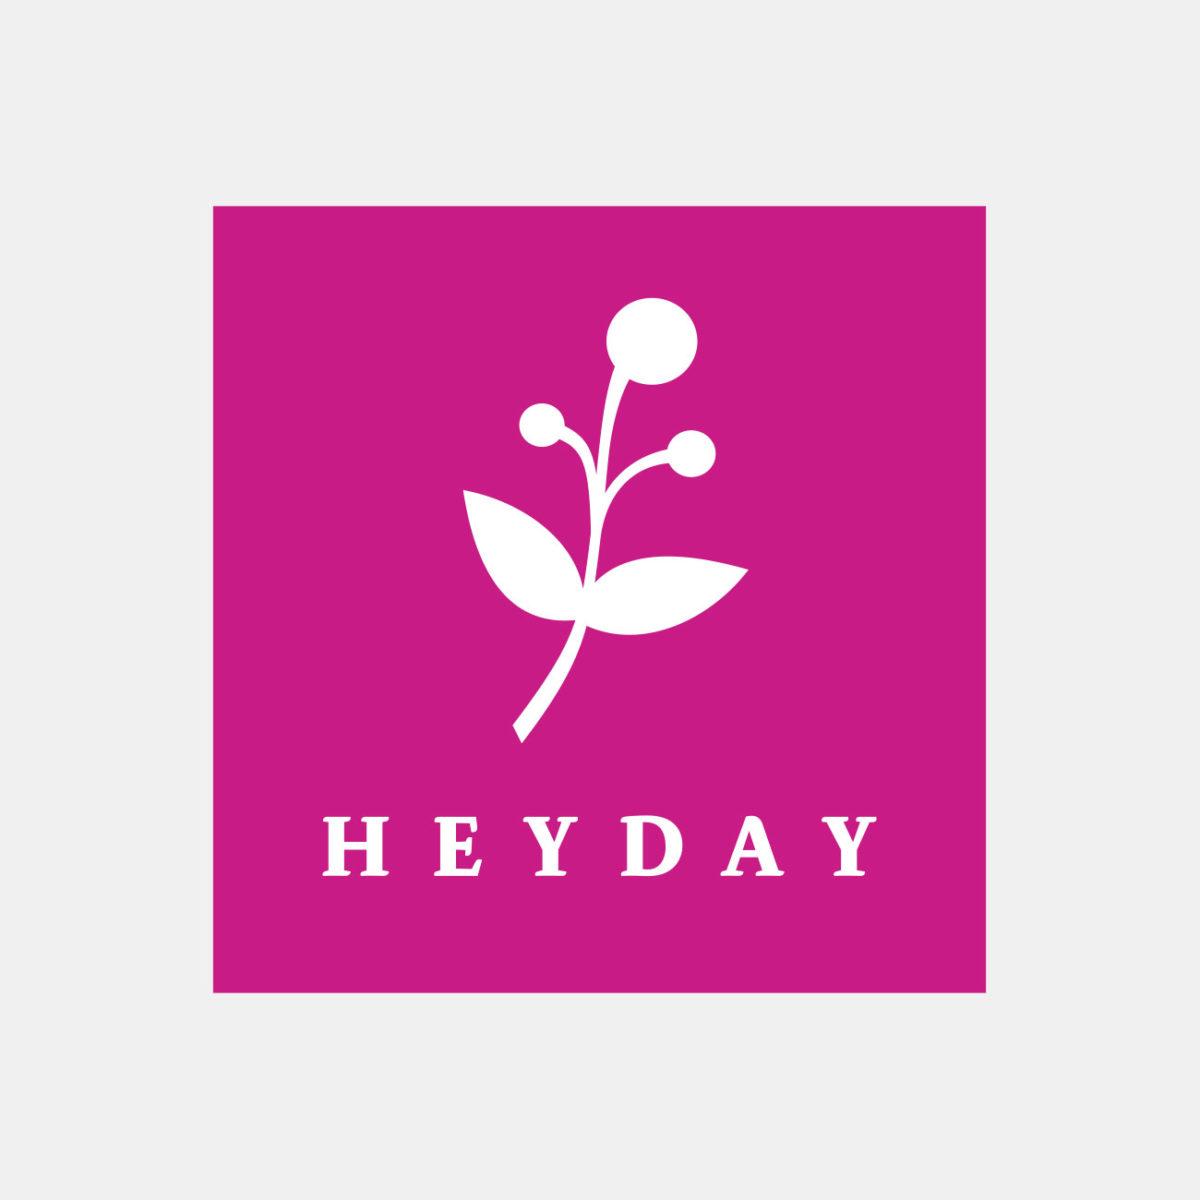 Heyday Logodesign